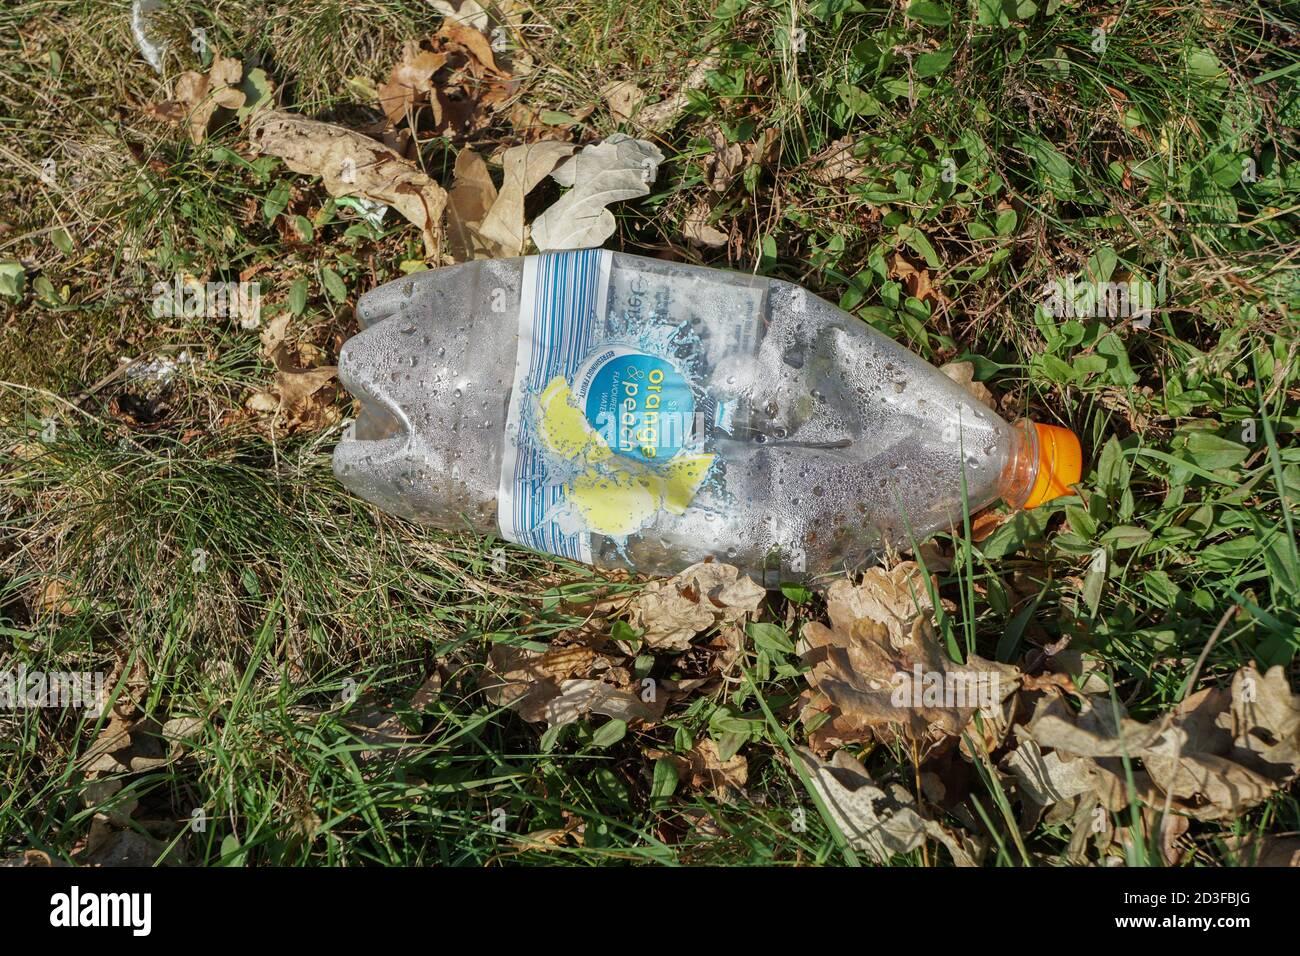 Discarde plastic drinks bottle on grass verge. England. UK Stock Photo